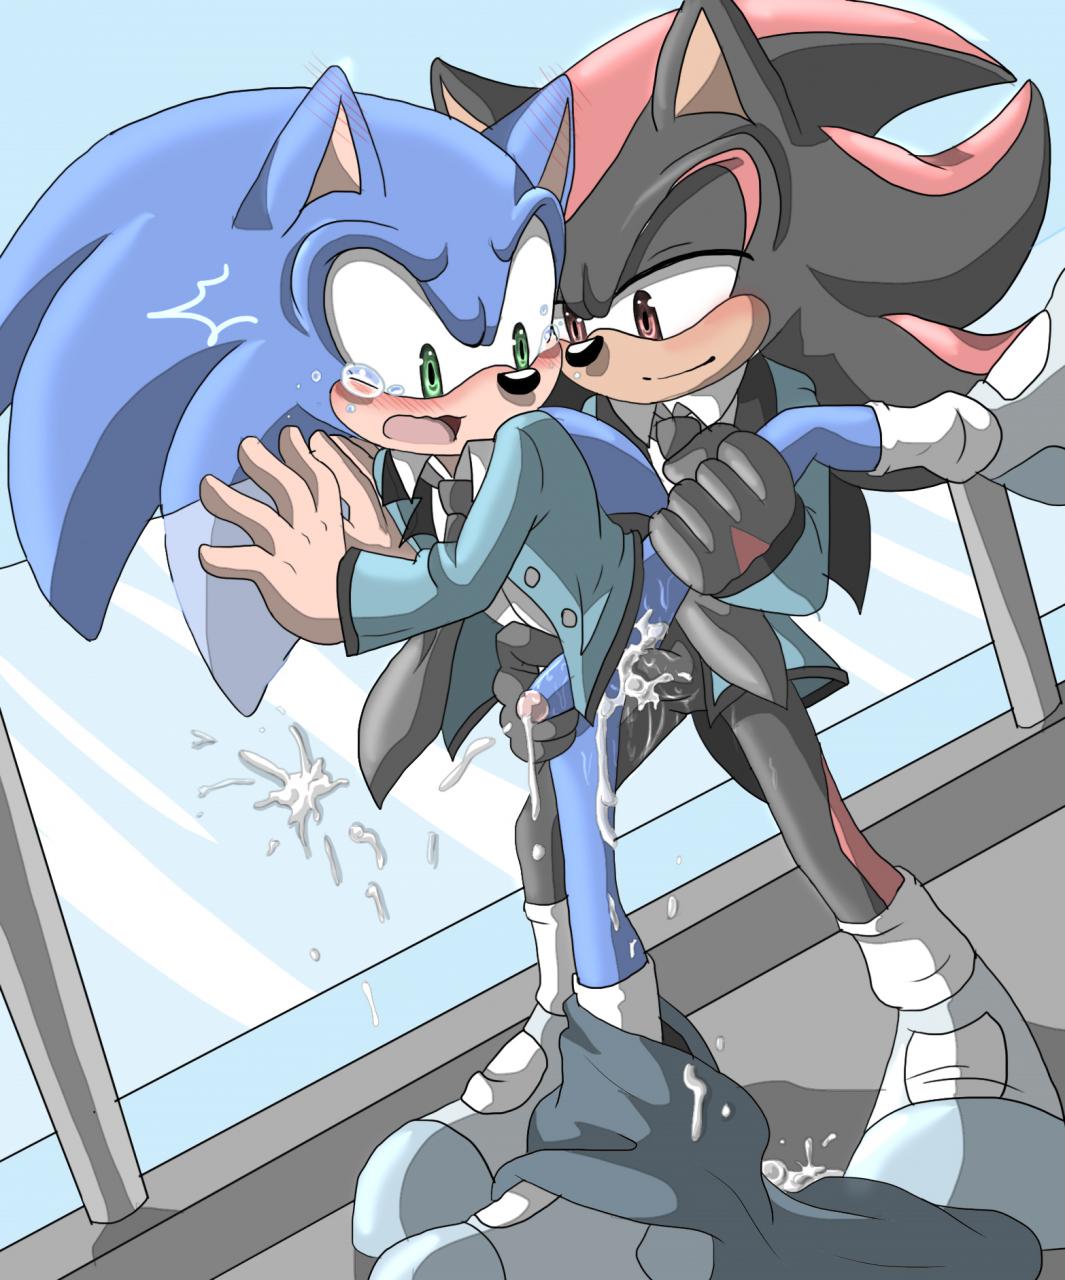 shadow the hedgehog+sonic the hedgehog